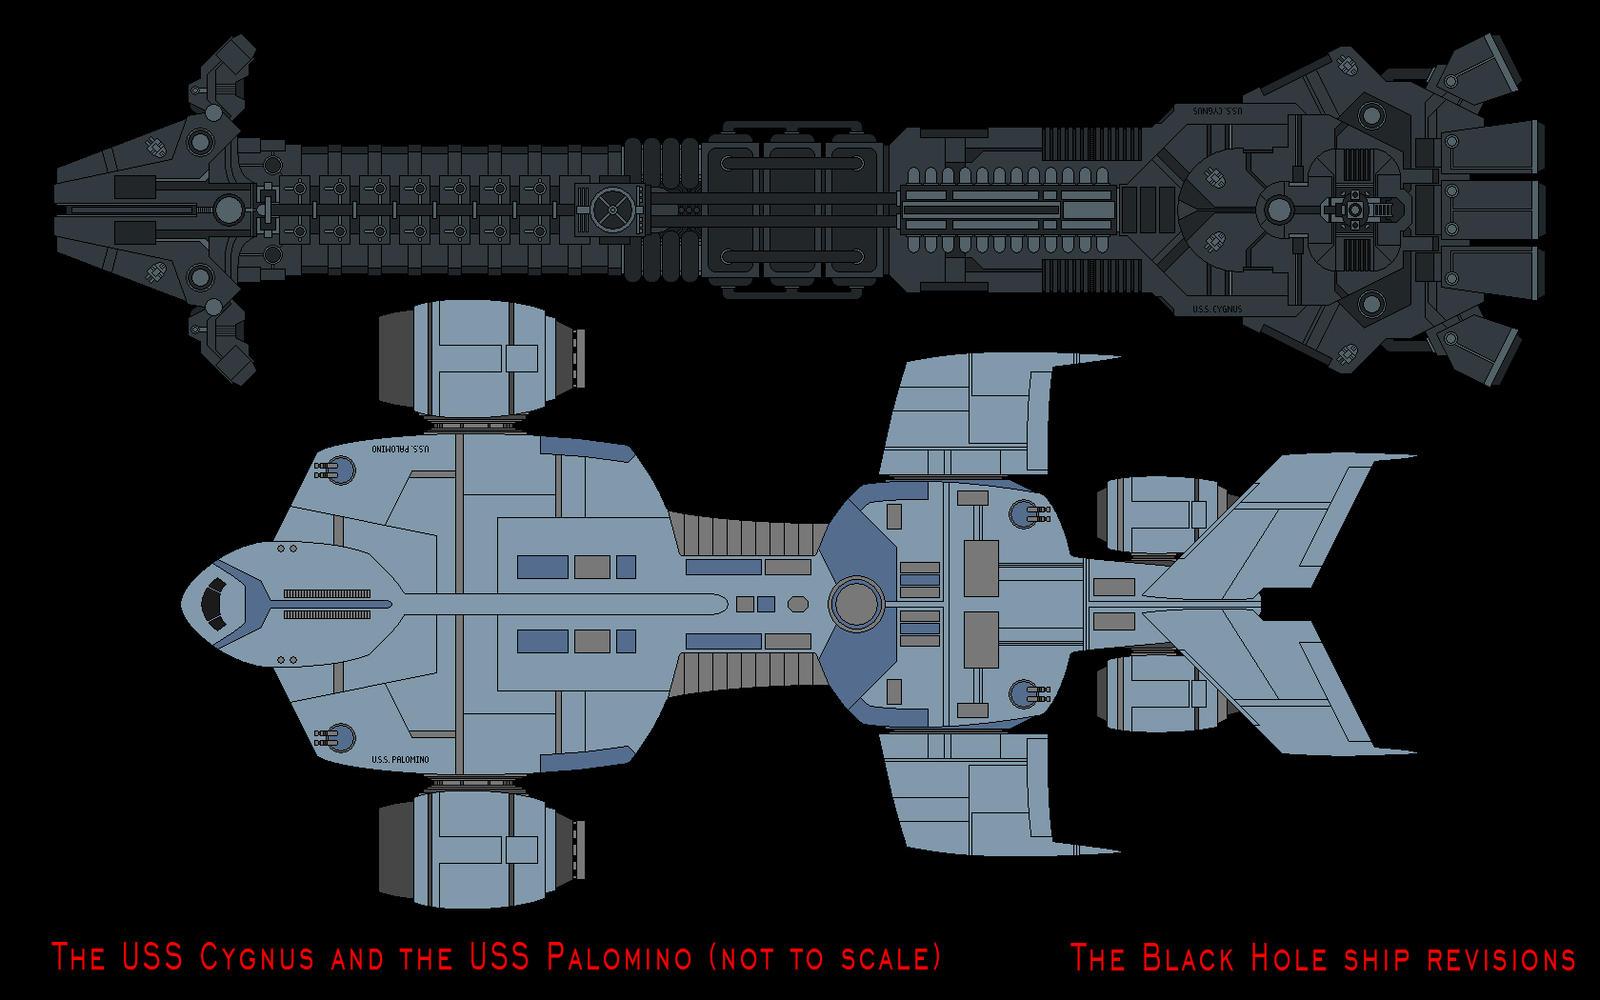 black hole movie ship - photo #17